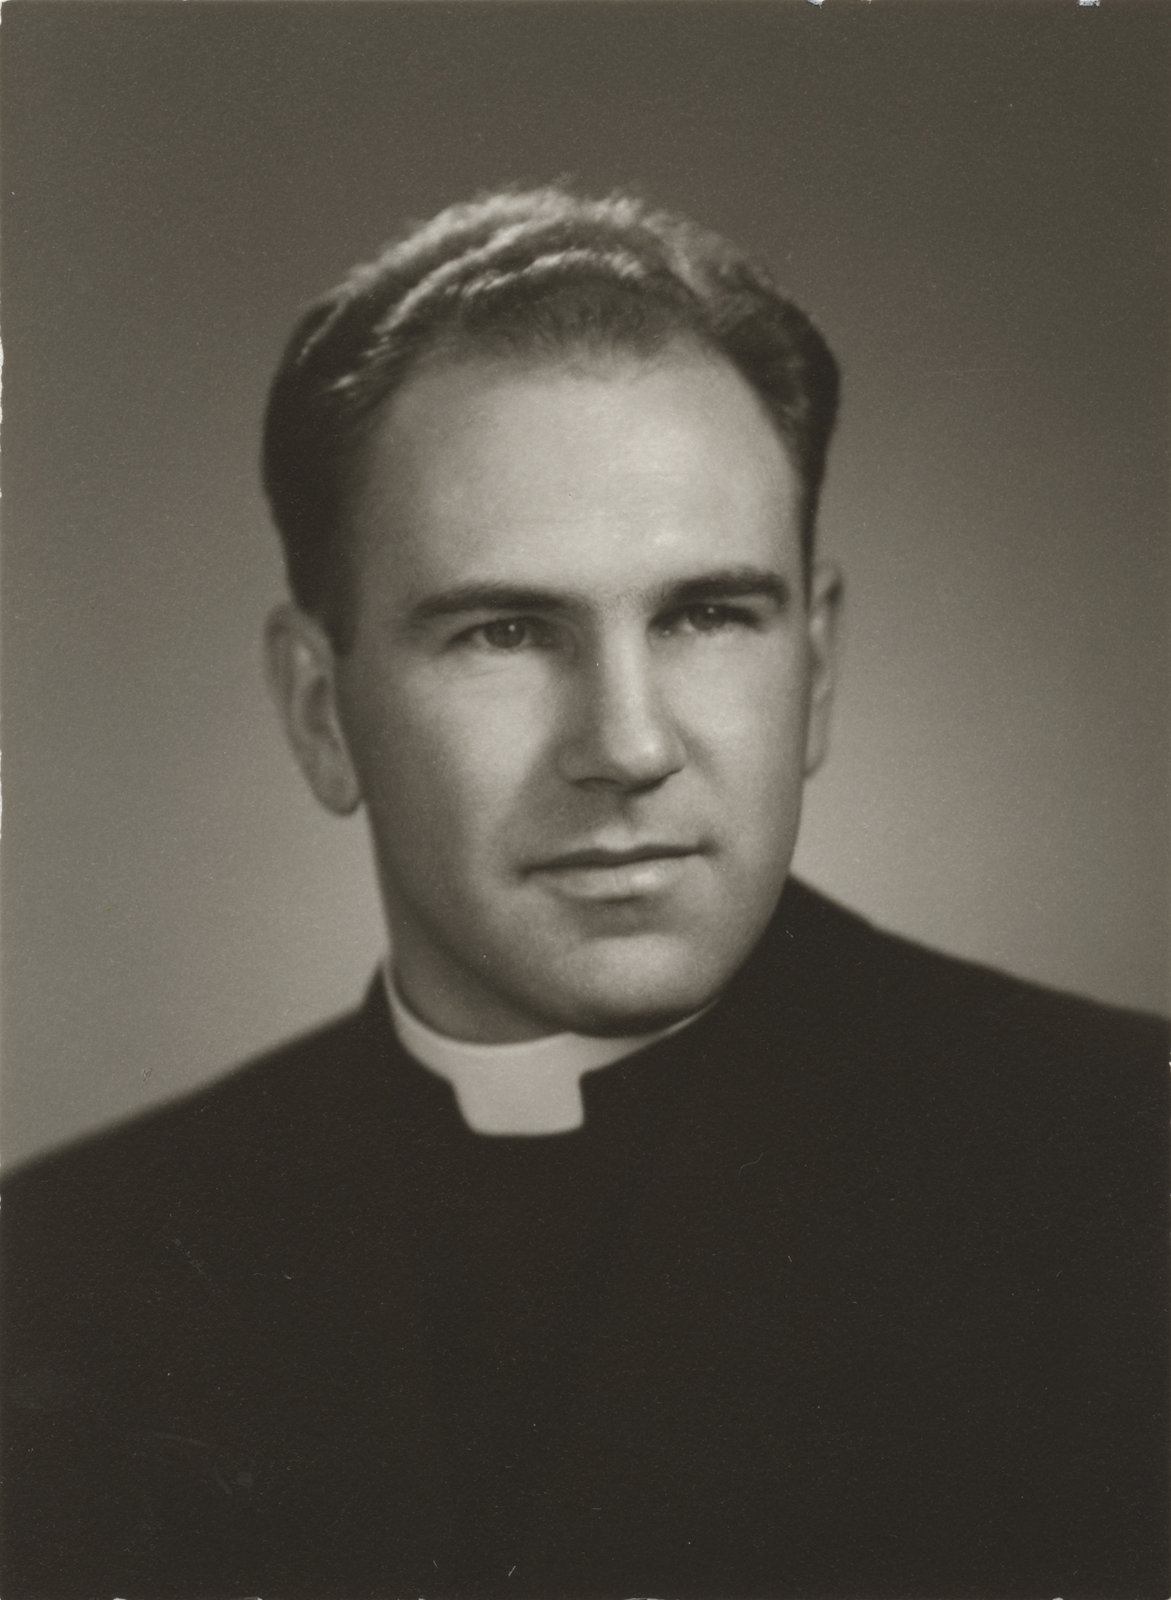 Norman Lange